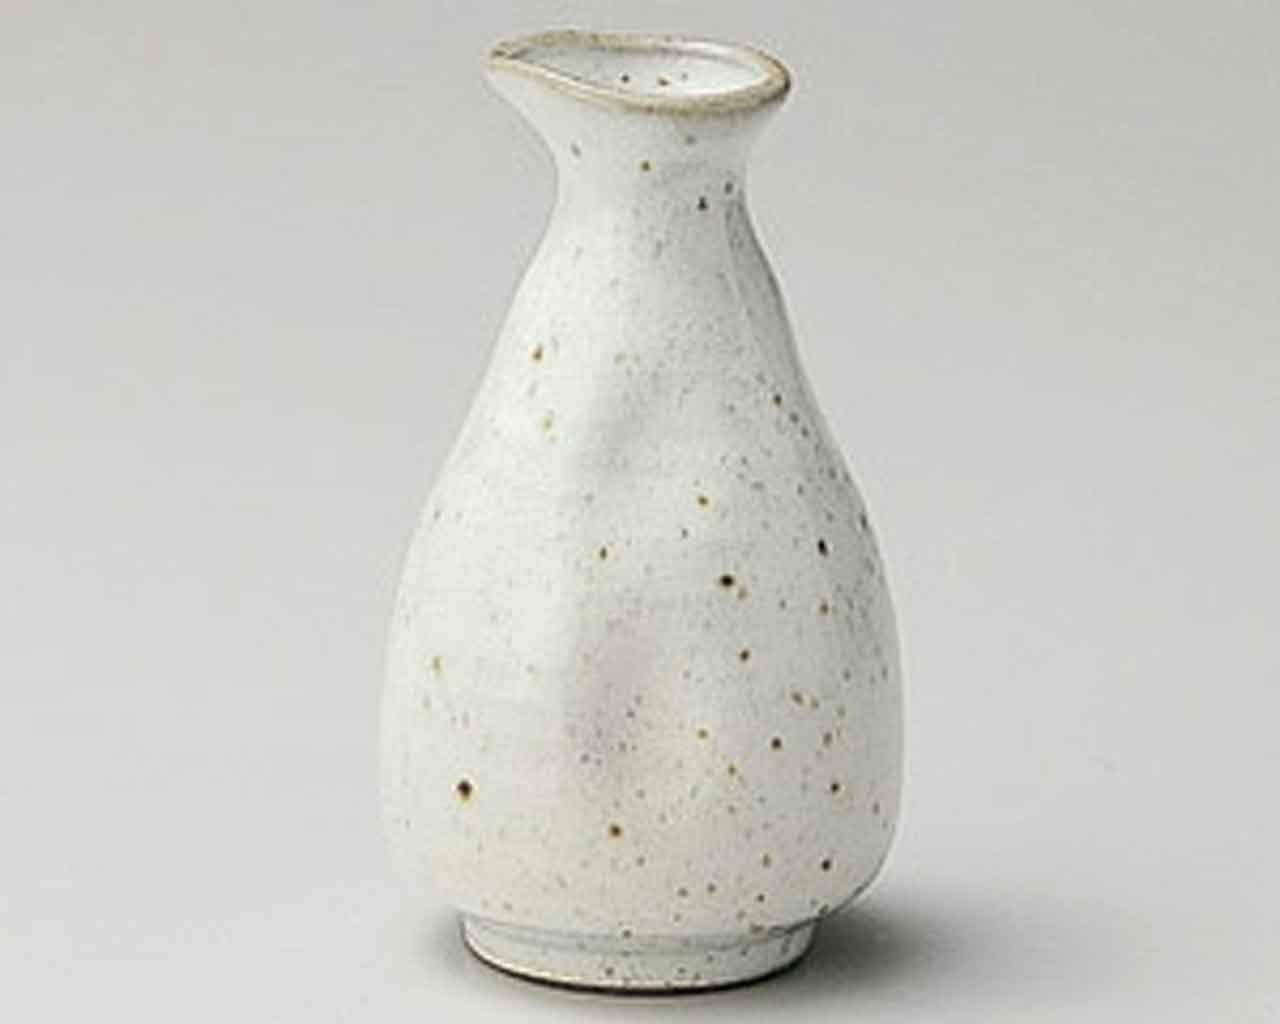 Kobiki Seiji 3.1inch Sake carafe White Ceramic Made in Japan